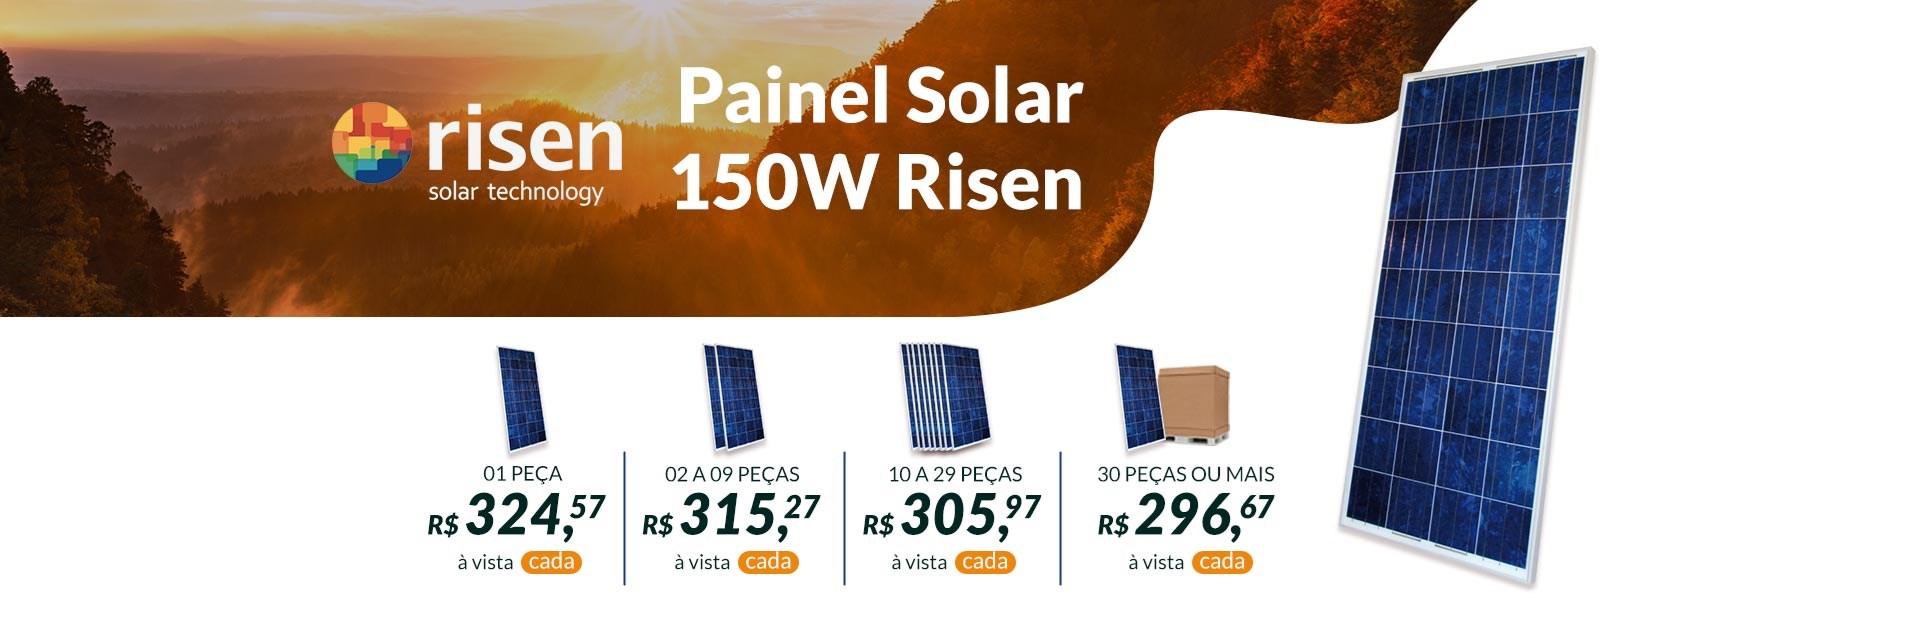 Painel Solar 150W Risen